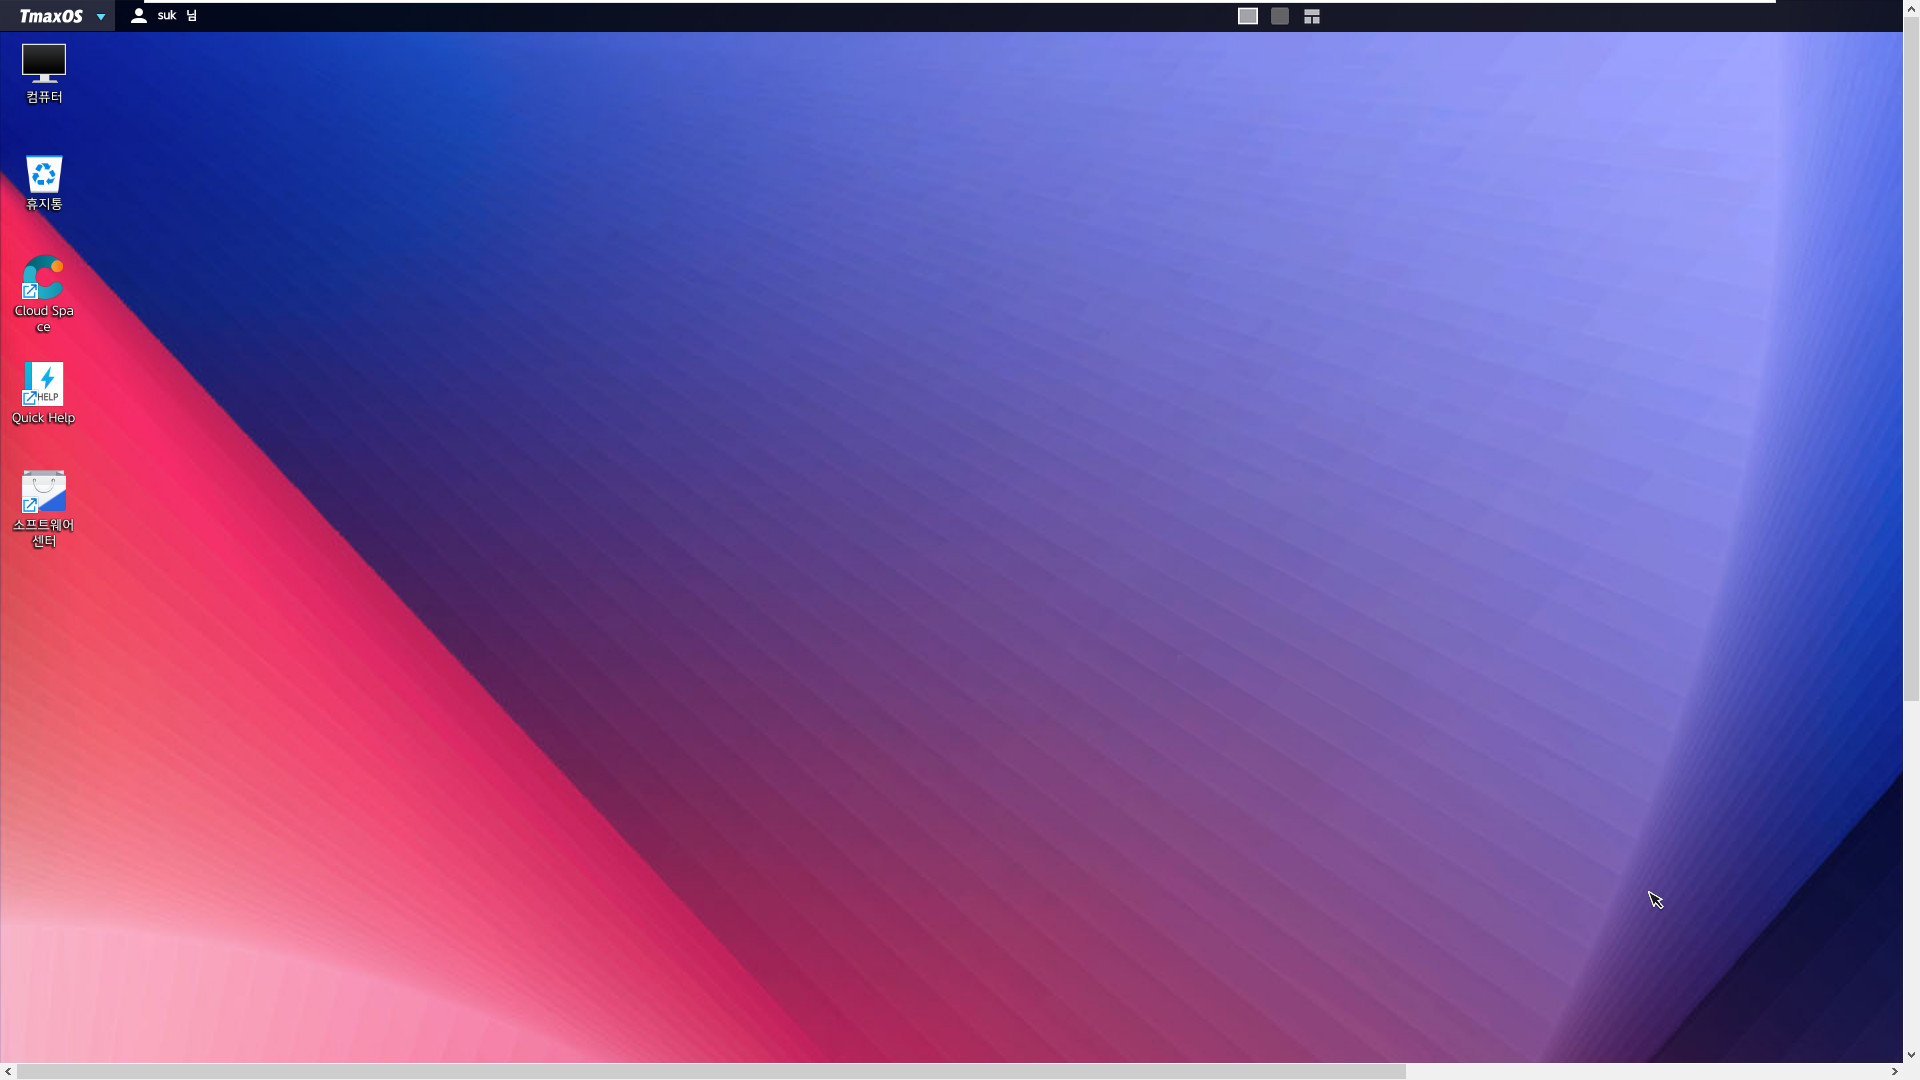 TmaxOS 설치 테스트 - 2번째 시도 - 이번에는 윈도에서 Tmax에서 제공한 T-Up TmaxOS.exe 으로 멀티 부팅으로 설치하기 2019-08-20_215016.jpg